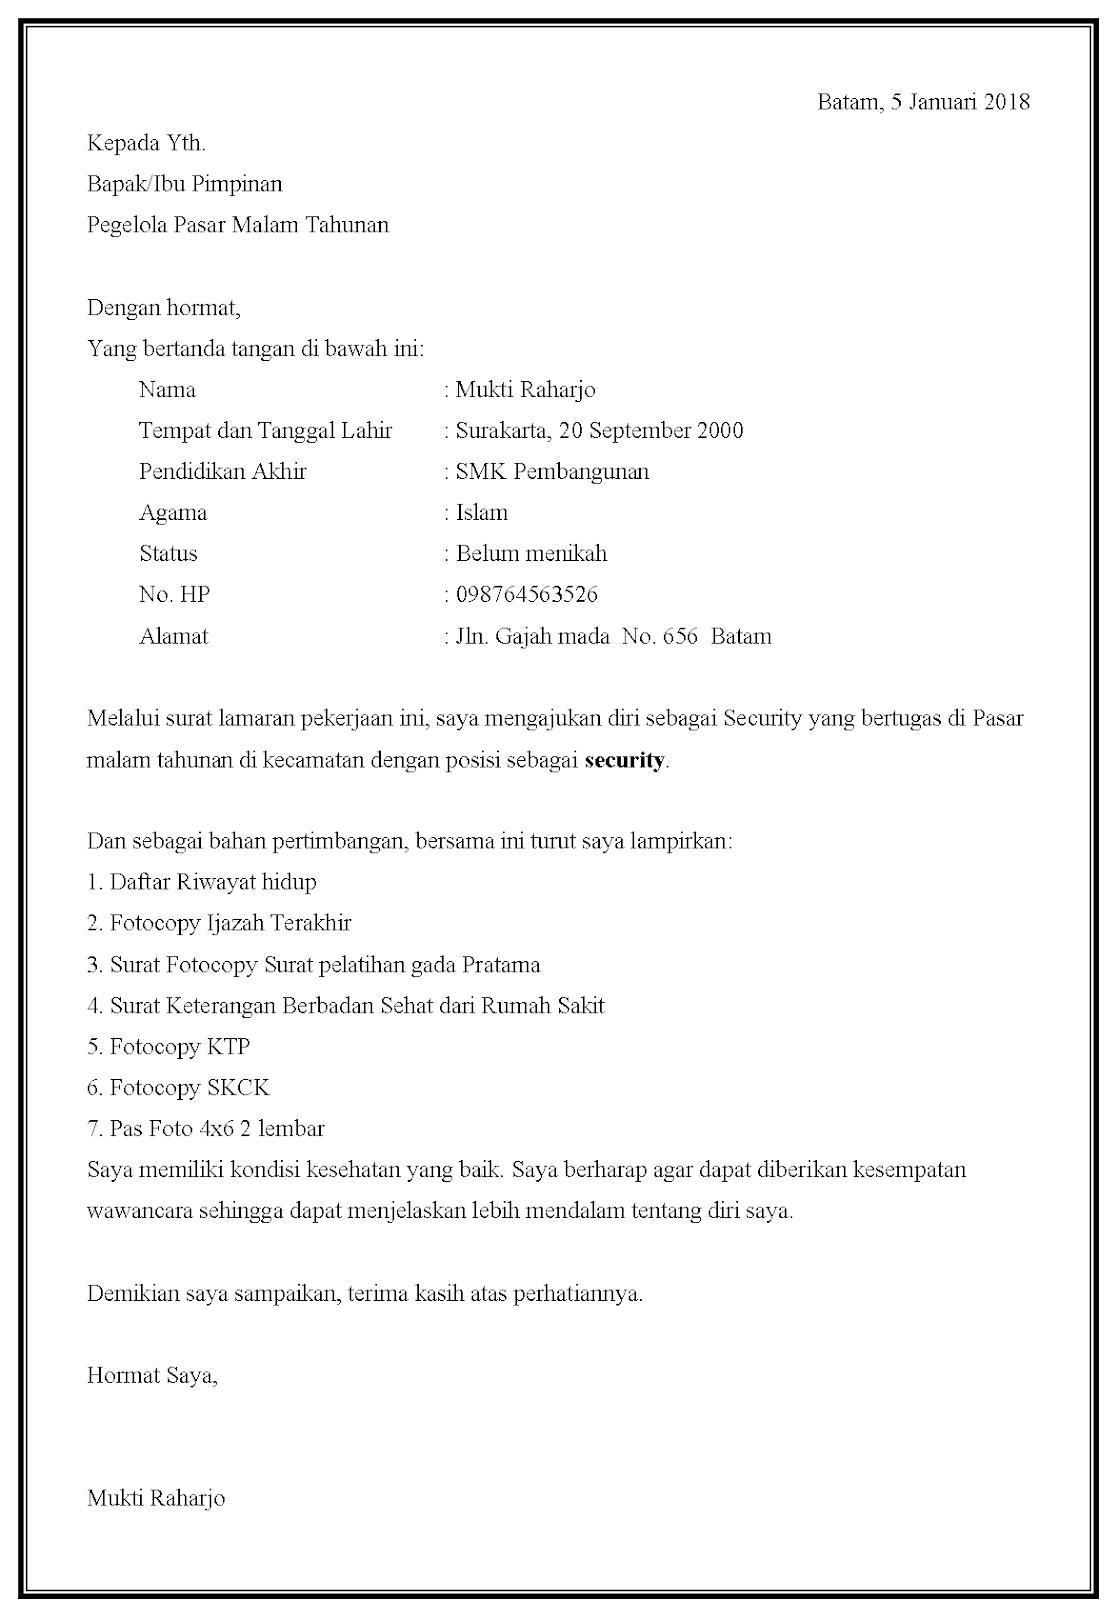 Contoh surat lamaran kerja security di acara-acara tertentu